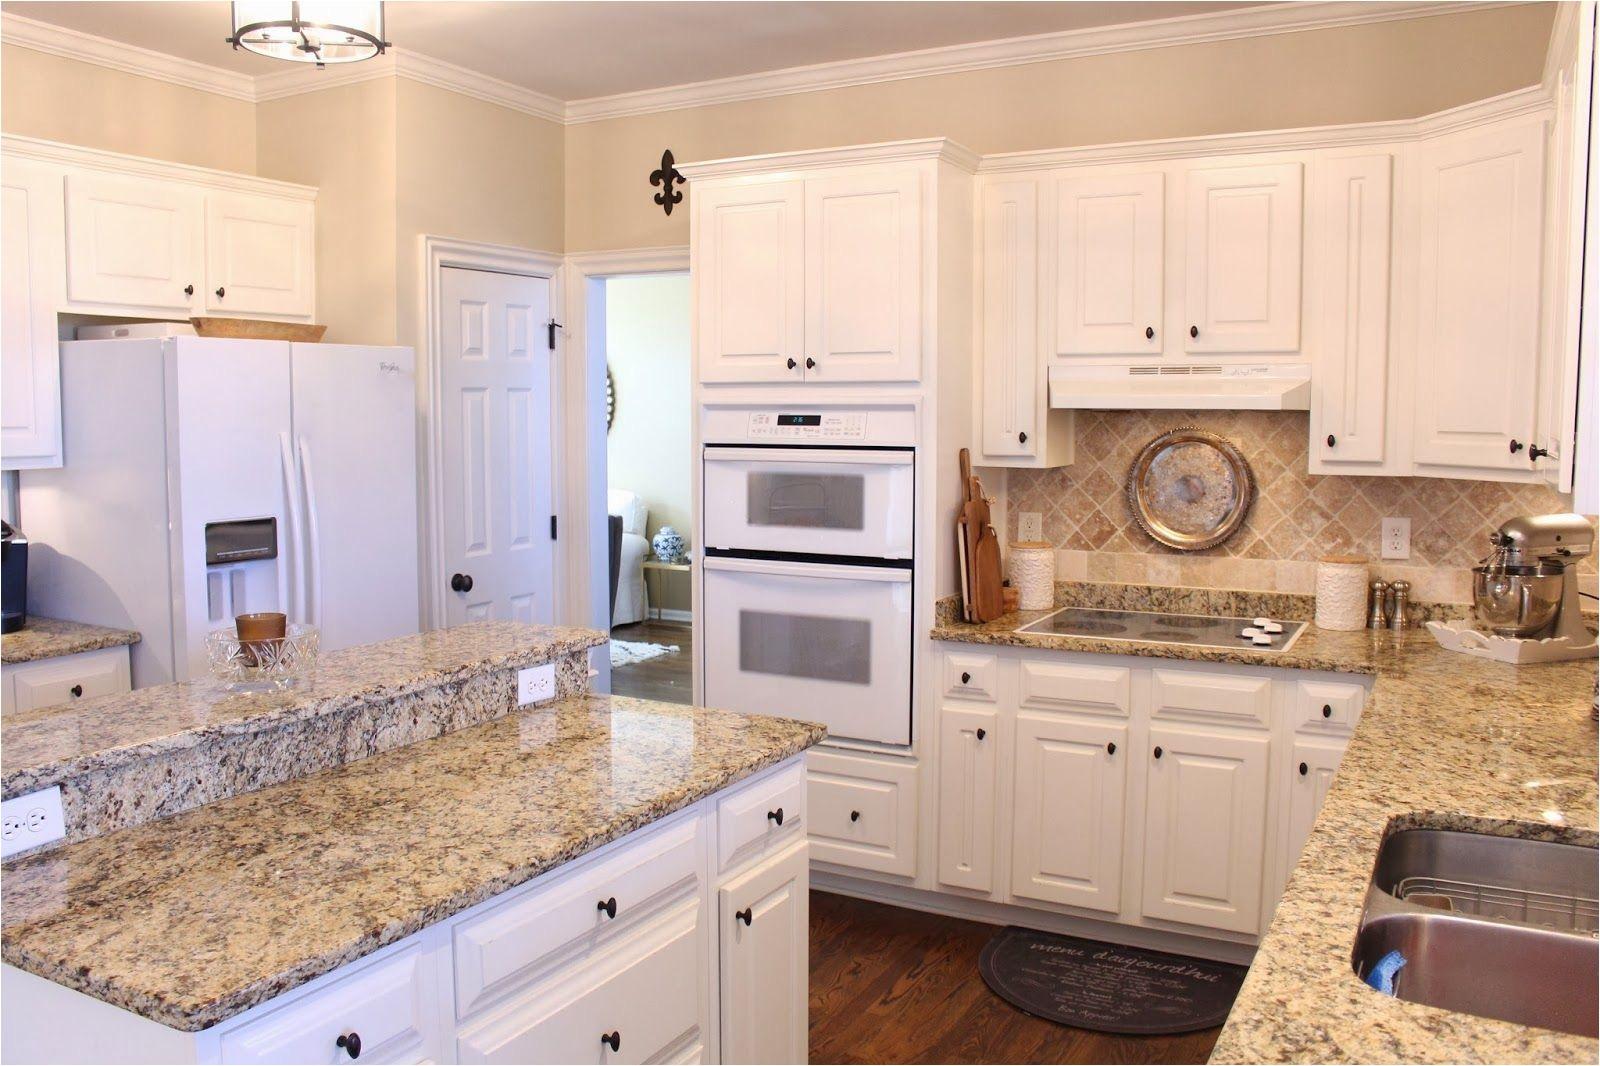 tiffanyd some progress in the kitchen beige kitchen cabinets white cabinets